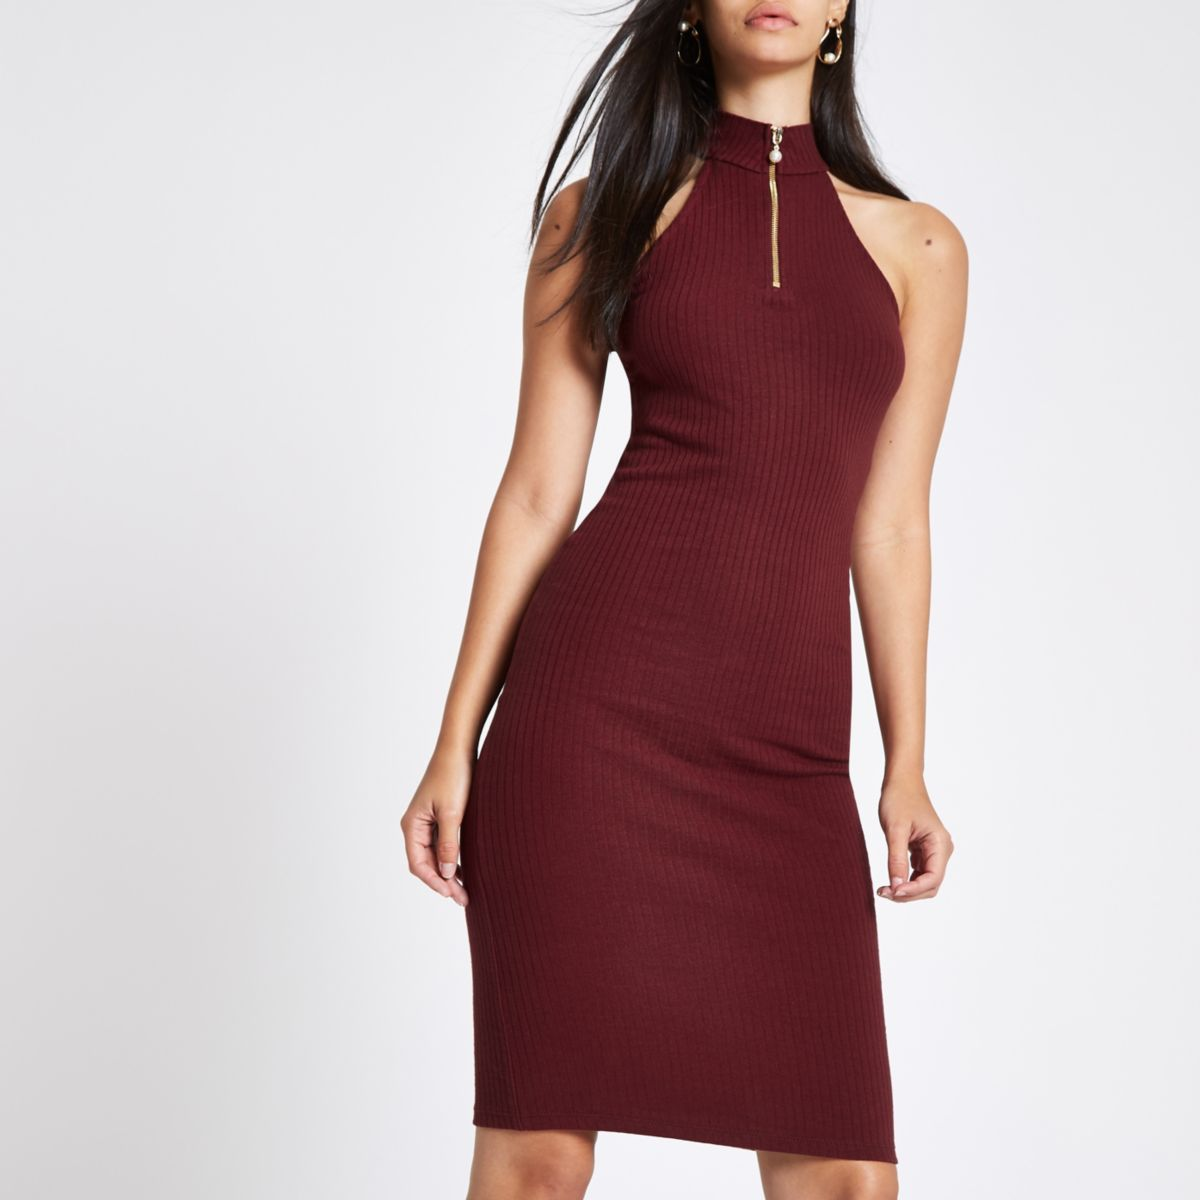 Dark red halter neck zip mini bodycon dress